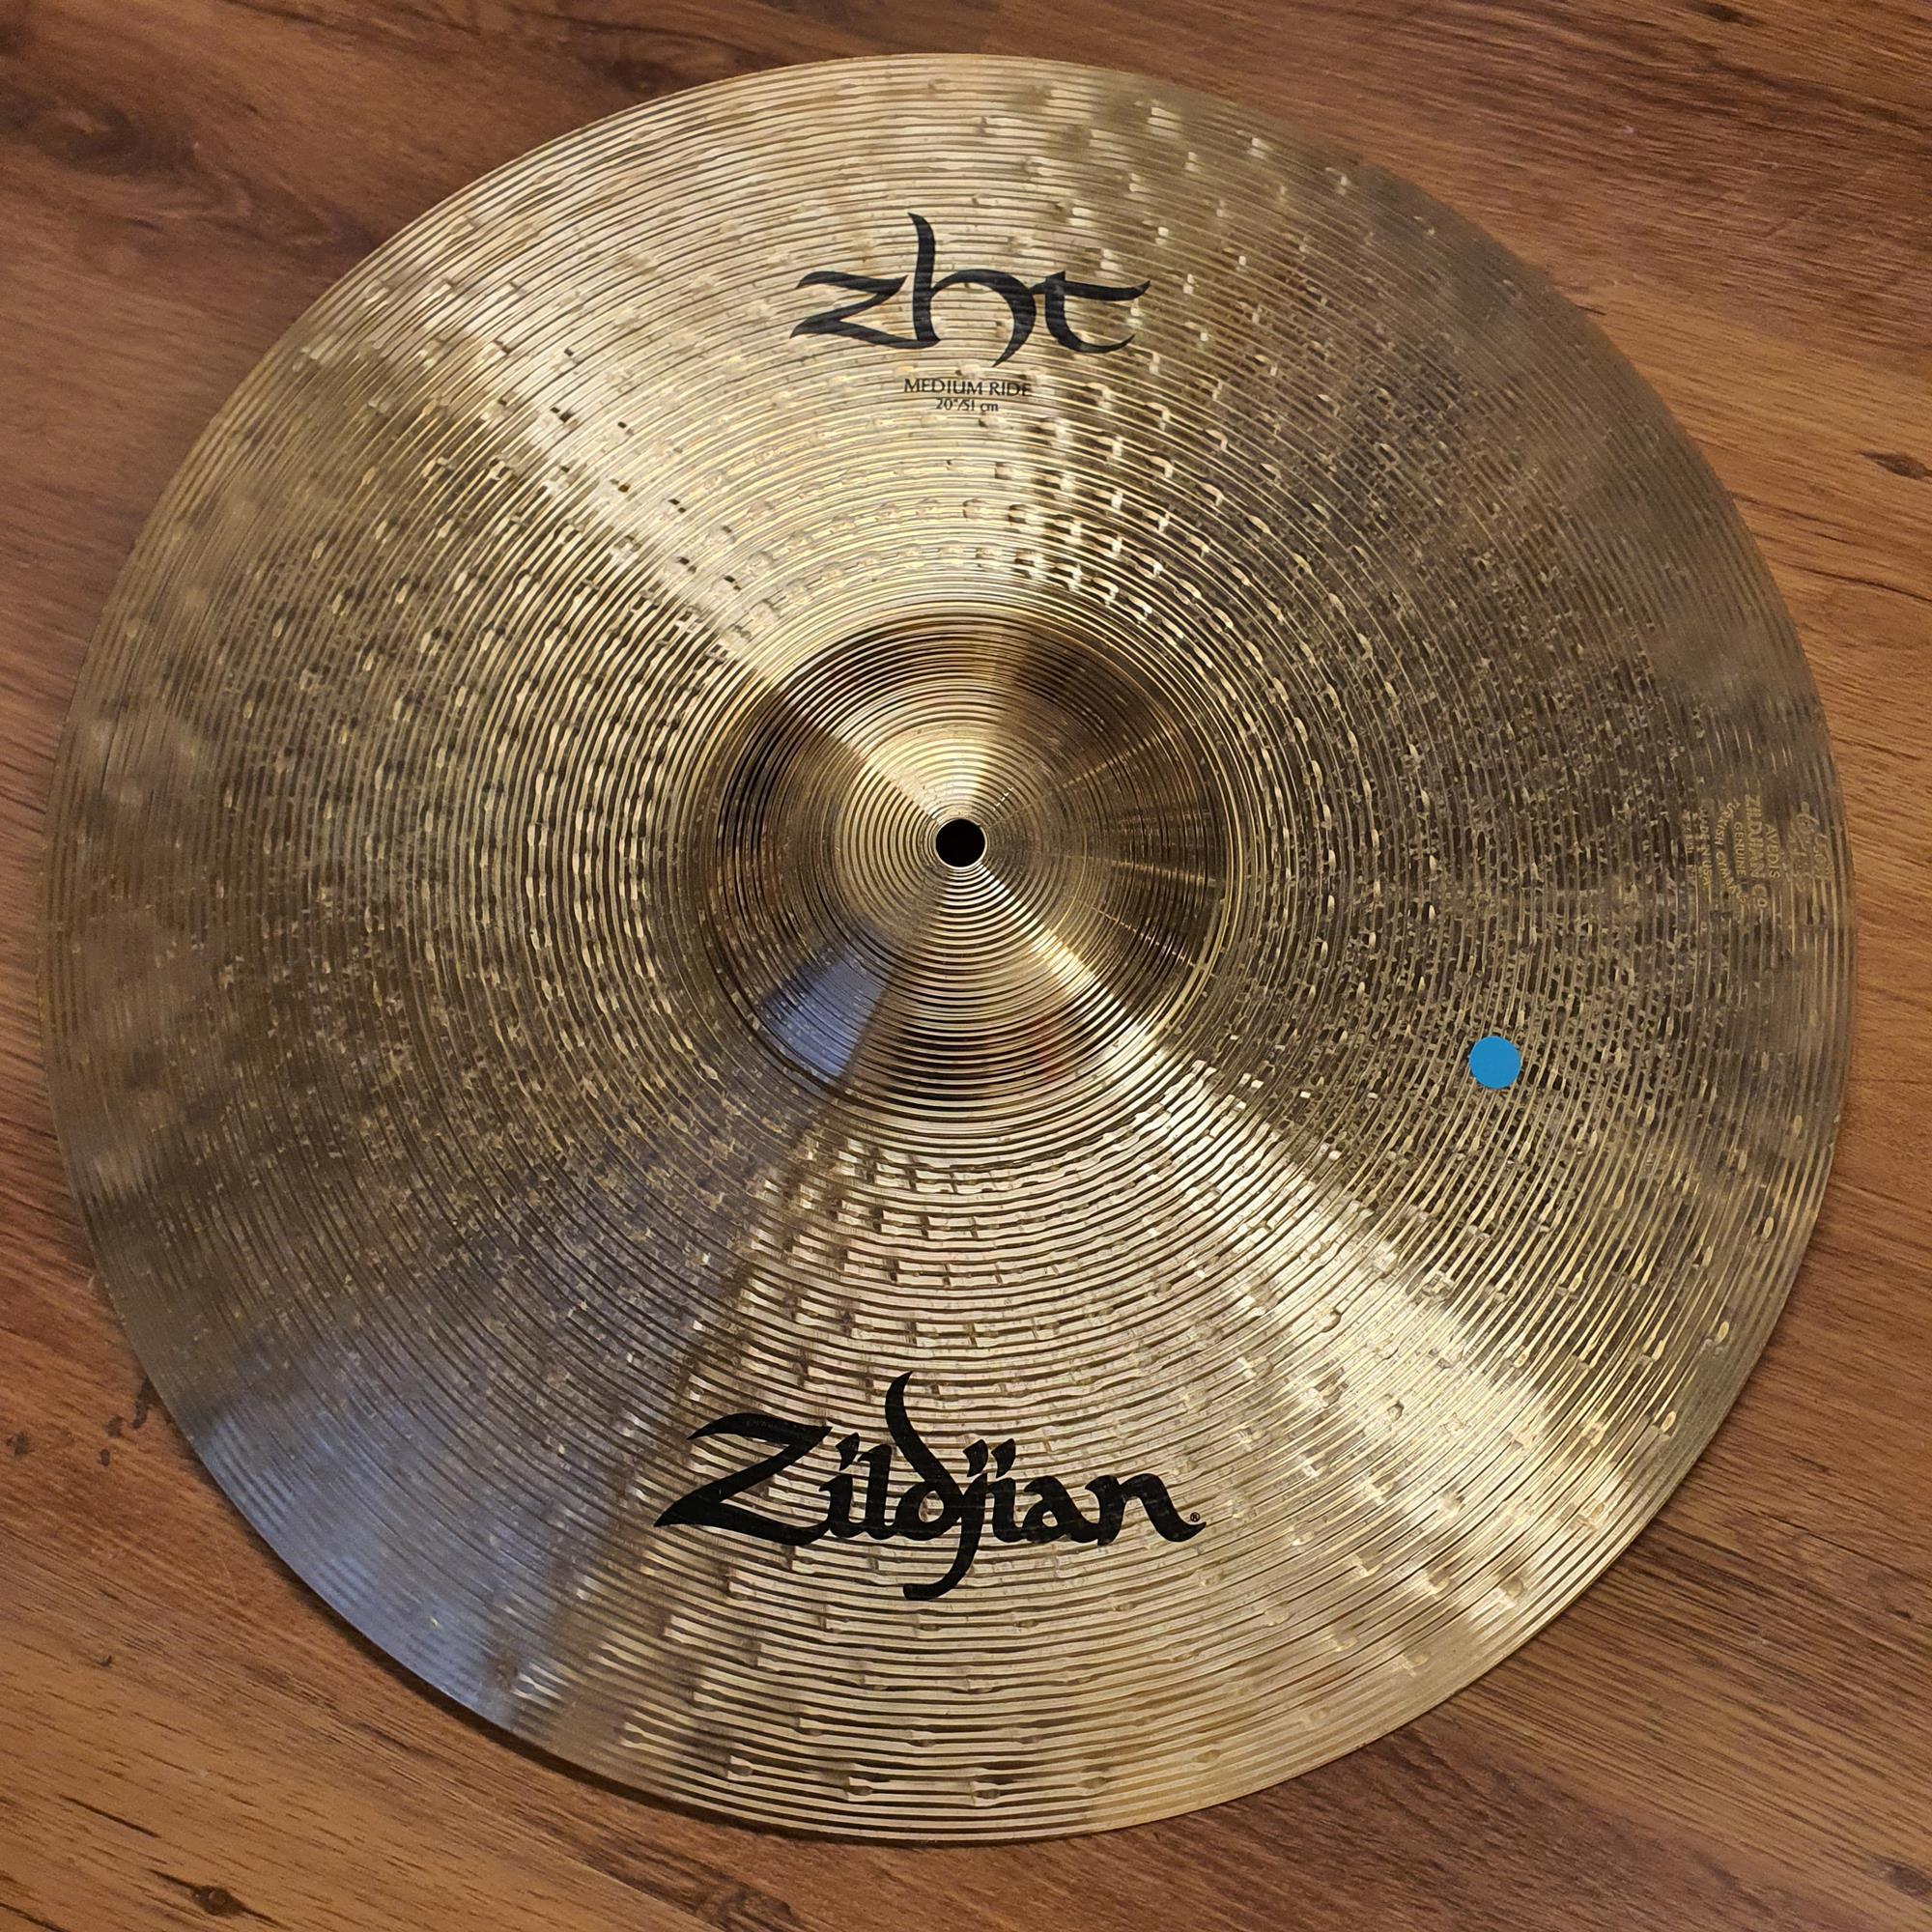 ZILDJIAN-ZHT-20-MEDIUM-RIDE-sku-1631985673810